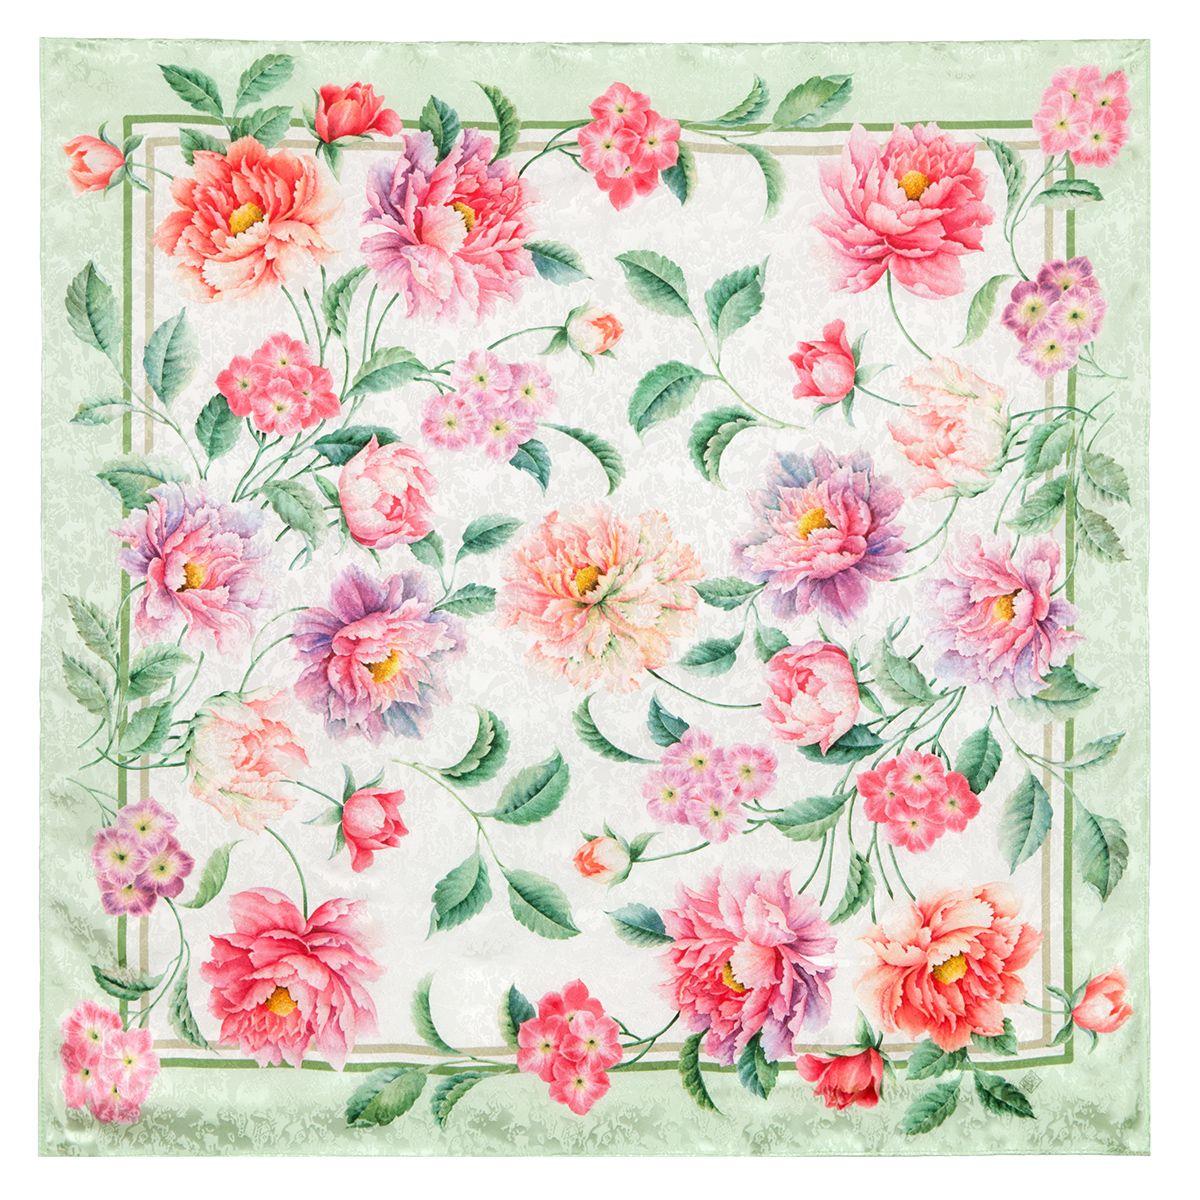 Платок «Весна в сердце» 10031-10